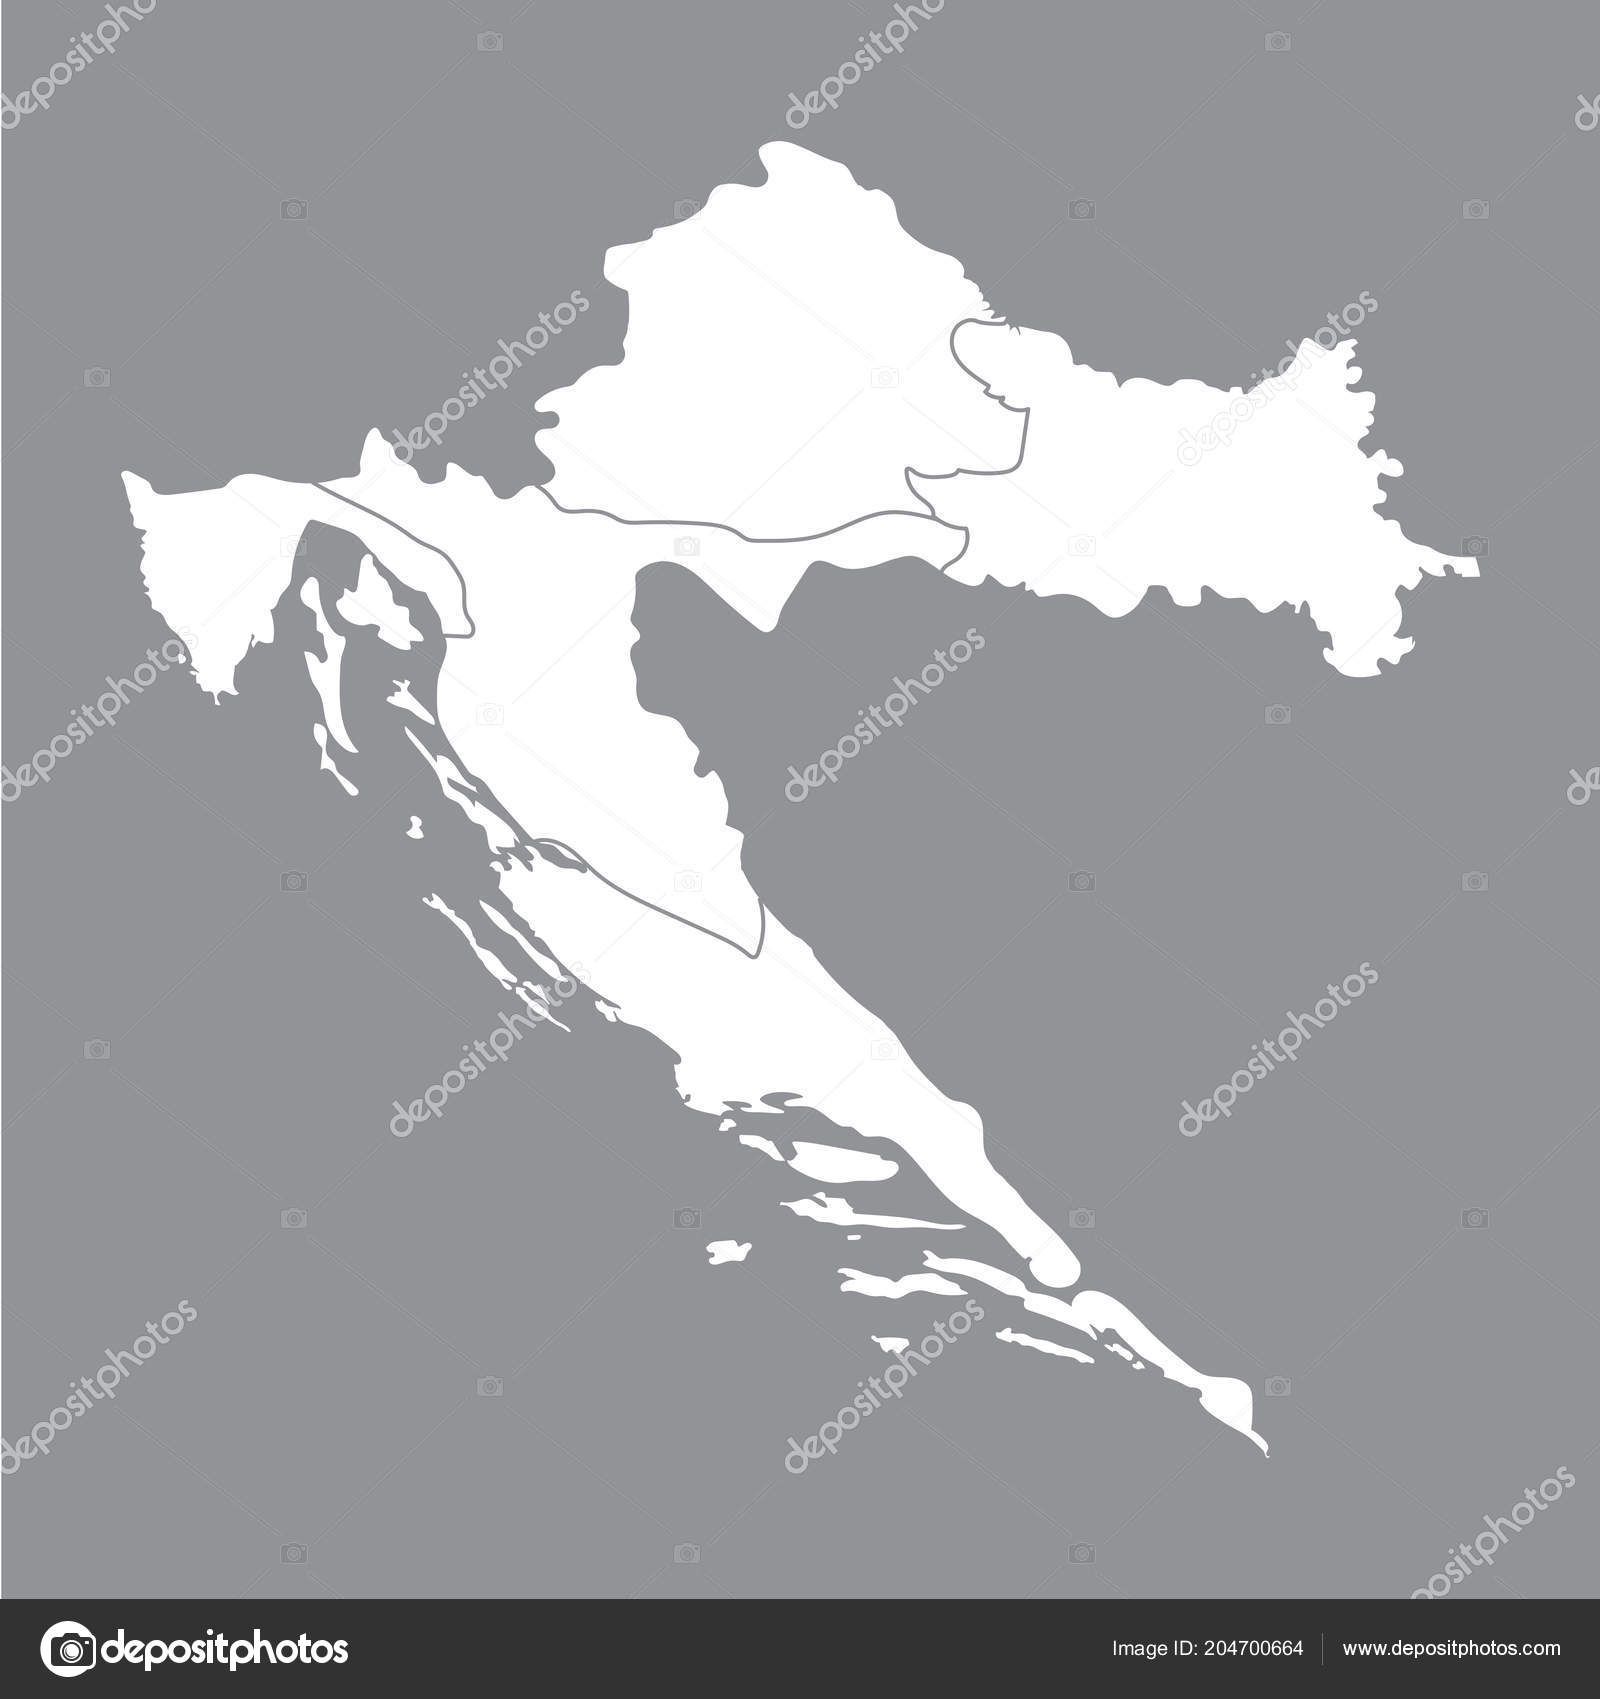 Cartina Muta Della Croazia.Blank Map Croatia High Quality Map Croatia Gray Background Map Vector Image By C Karinanh Vector Stock 204700664